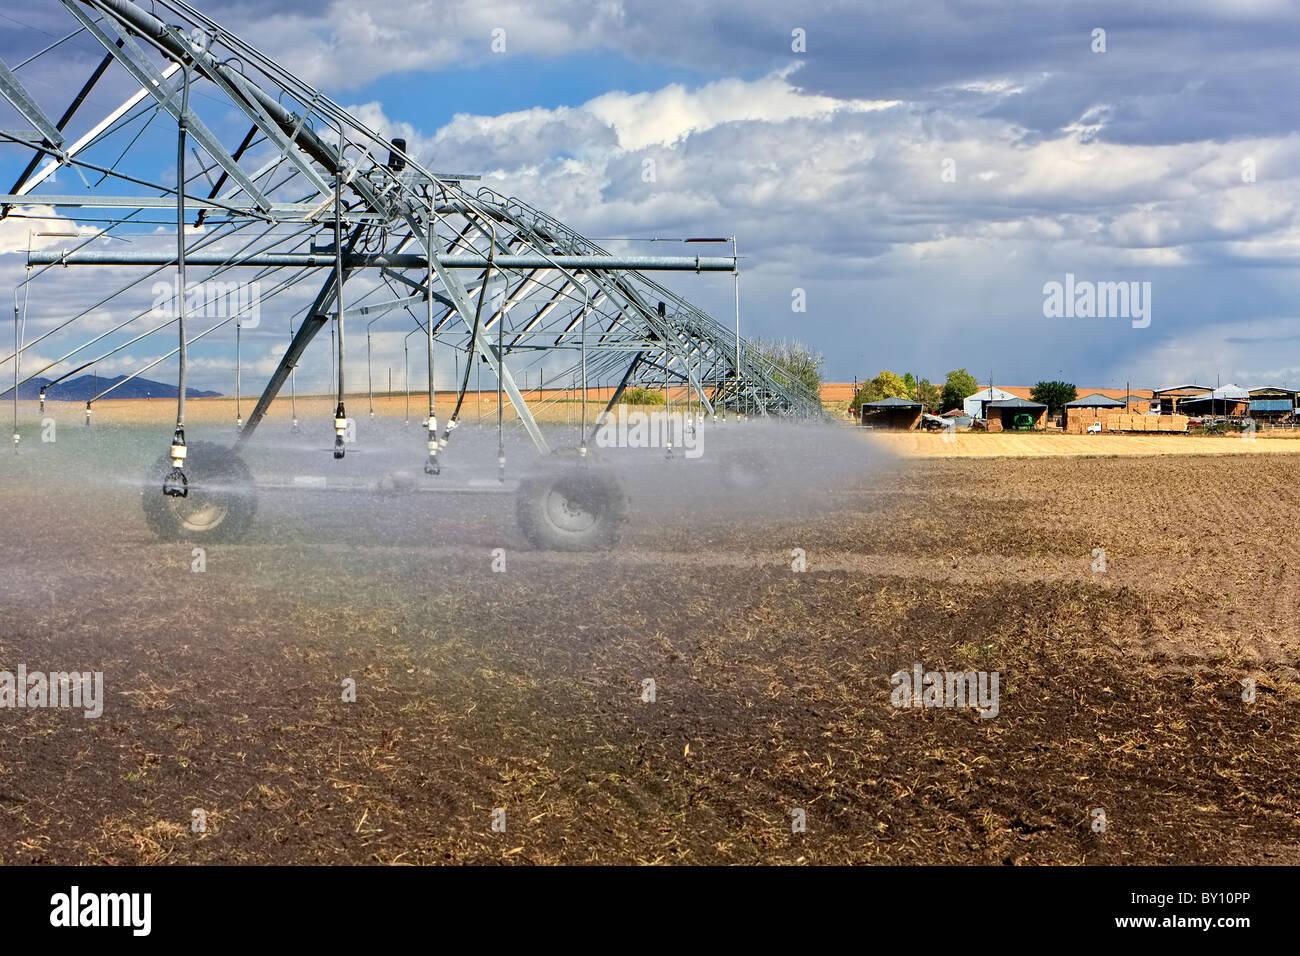 Agriculture watering/sprinklers - Stock Image